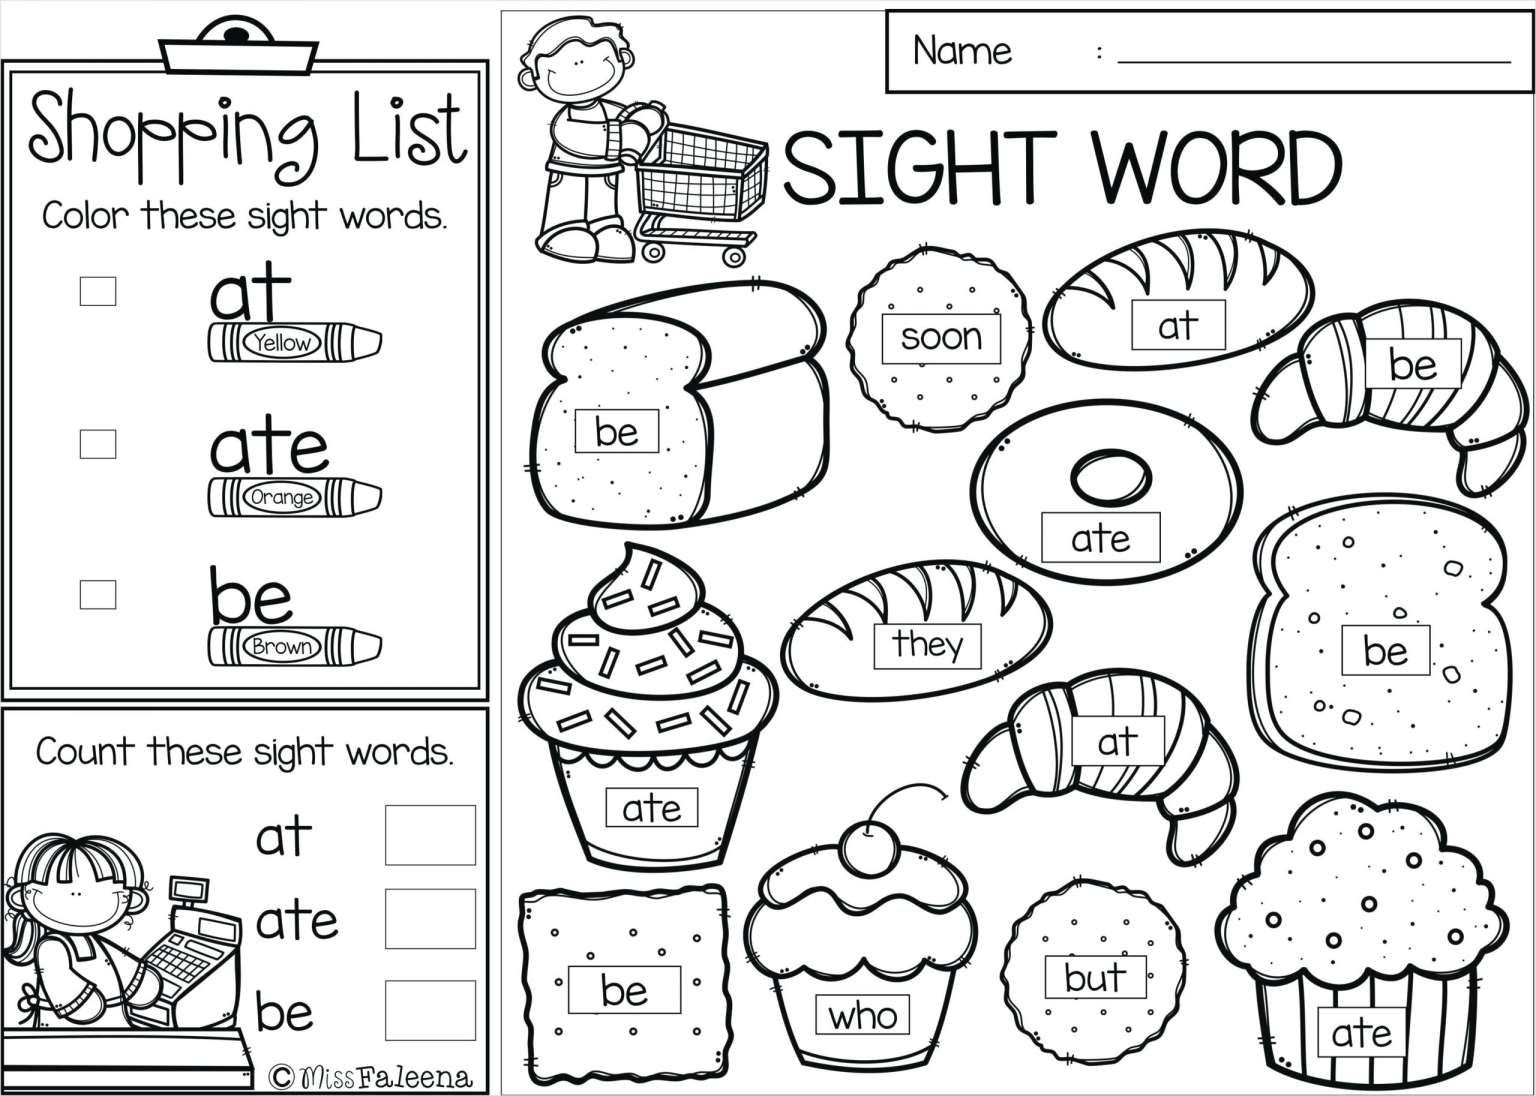 Worksheet On Myself For Kindergarten And Kindergarten